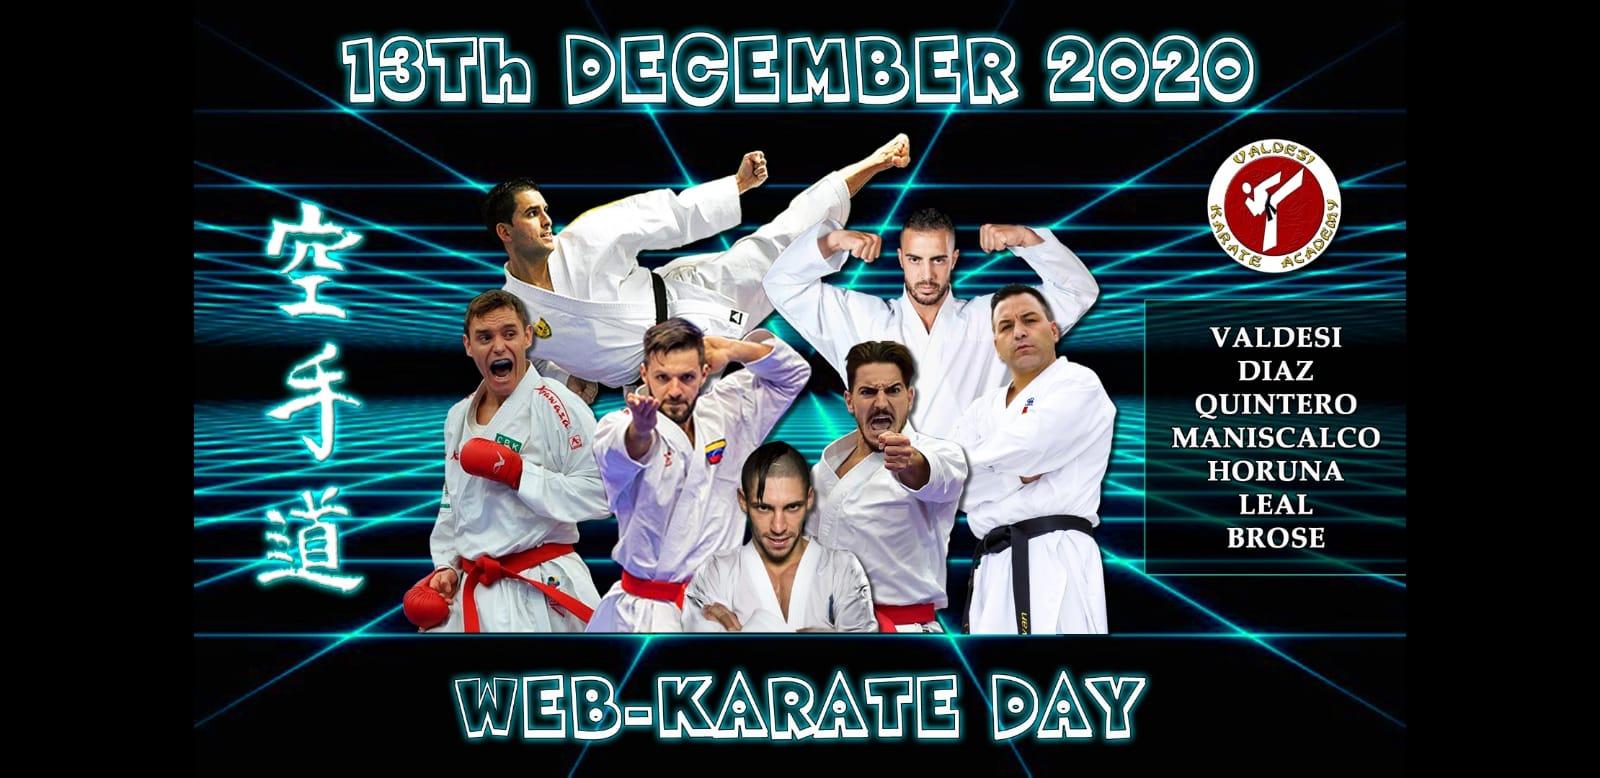 Web Karate Day - Session Kumite - Leal